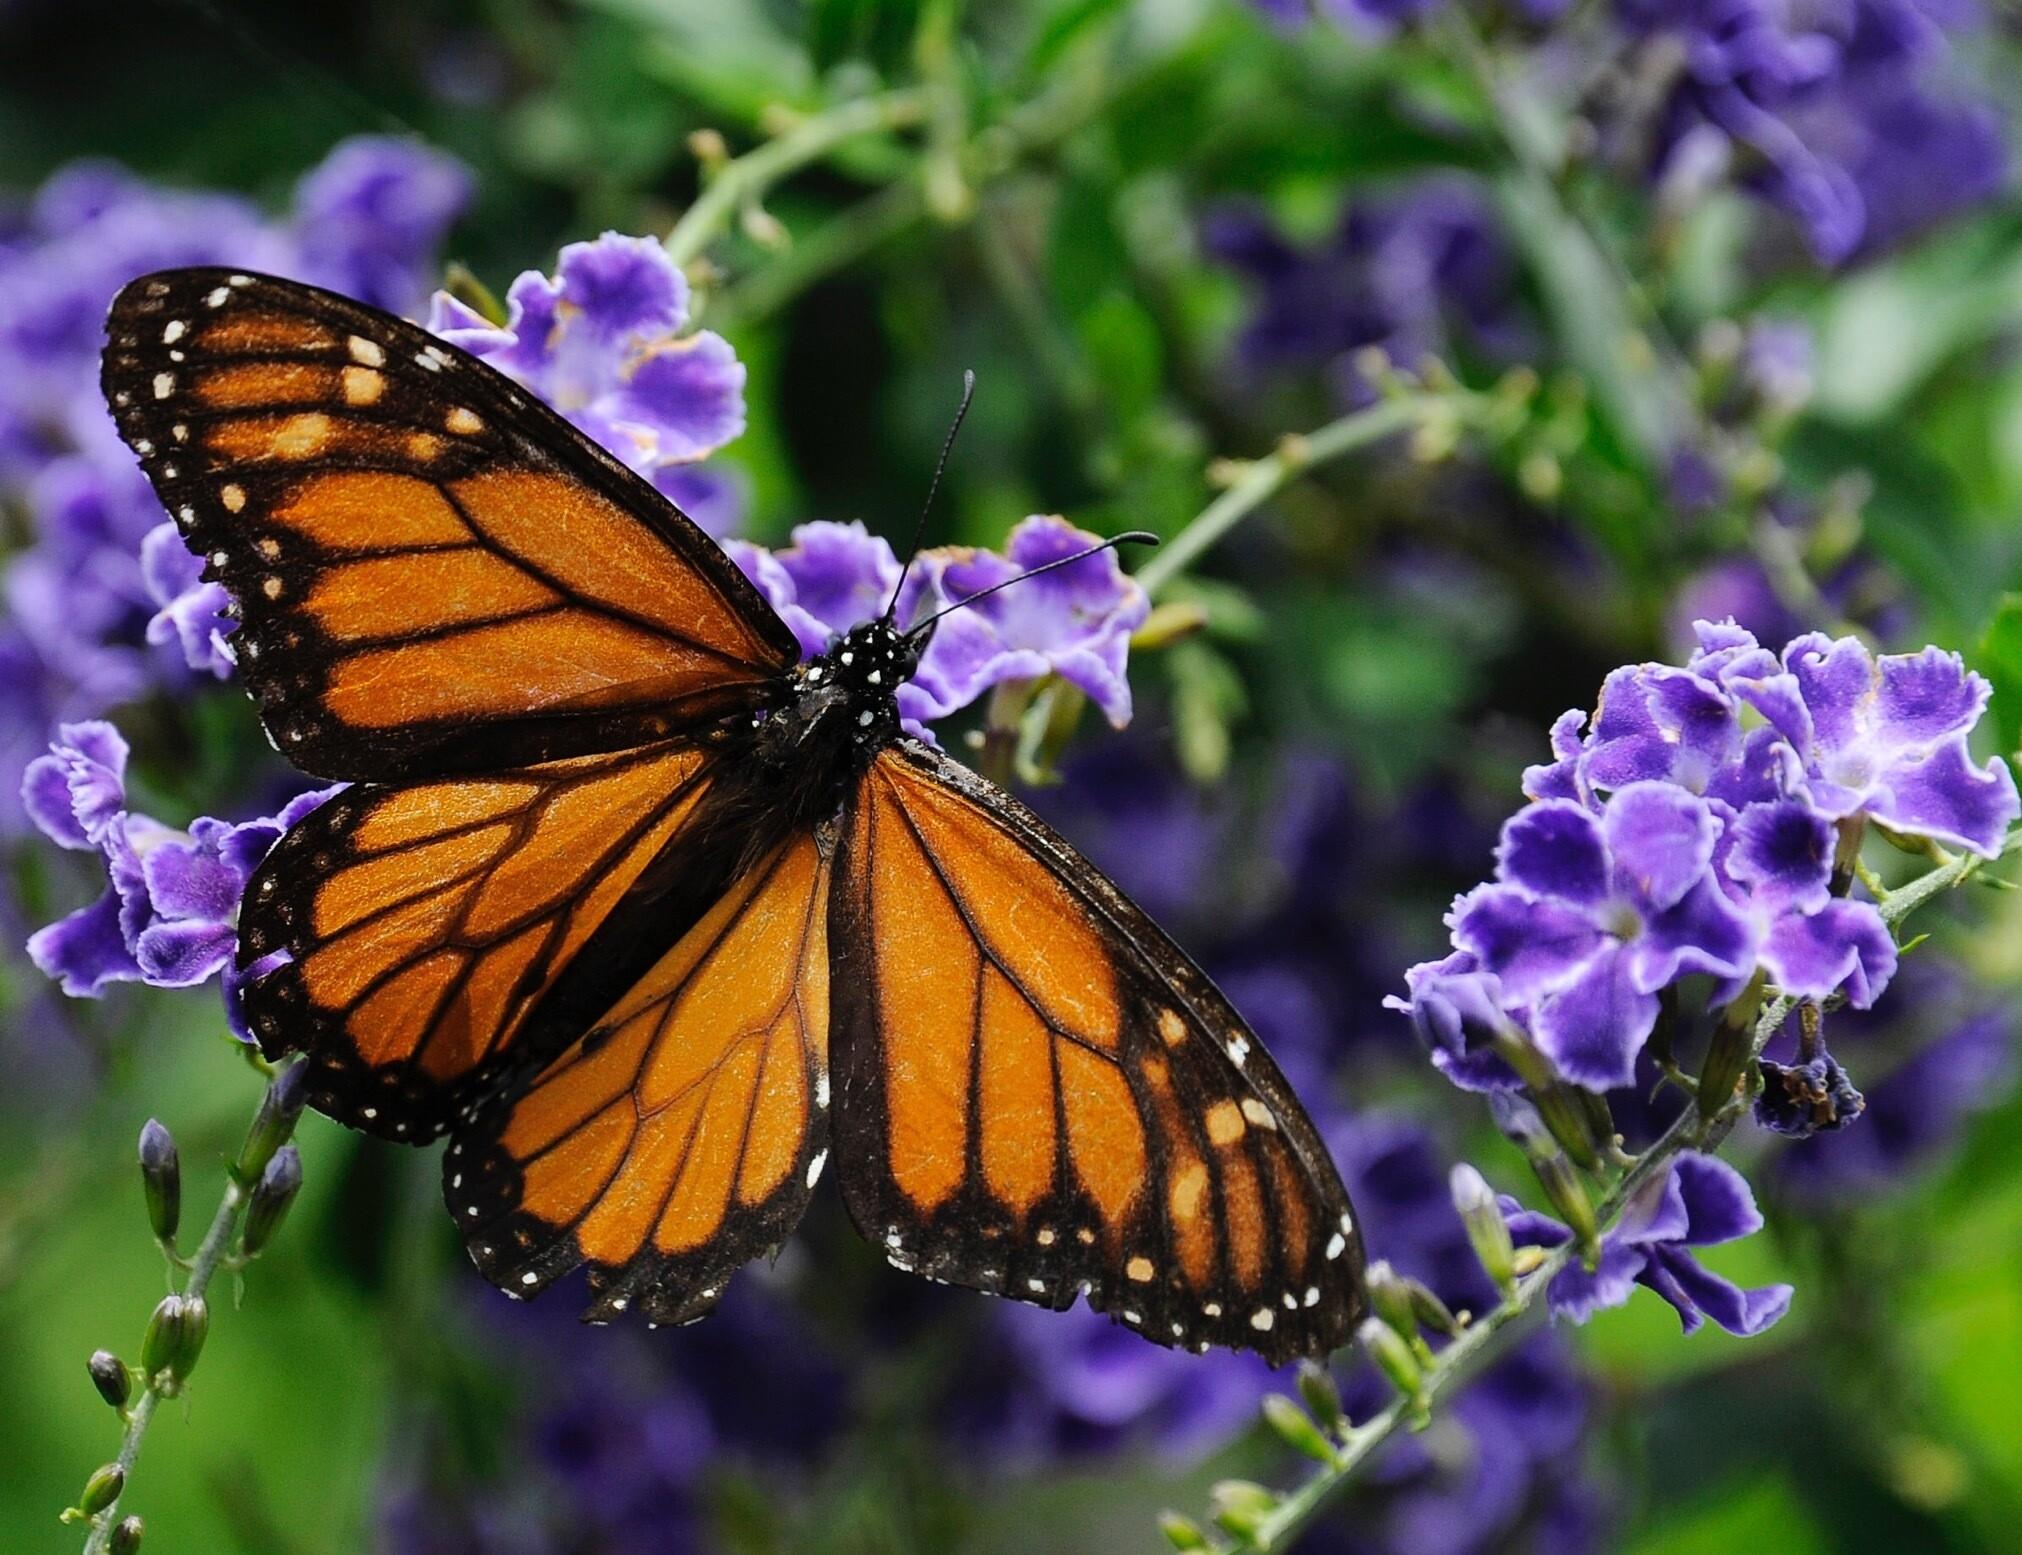 monarch mayhem 91 of butterflies vanish just 93 million of 1